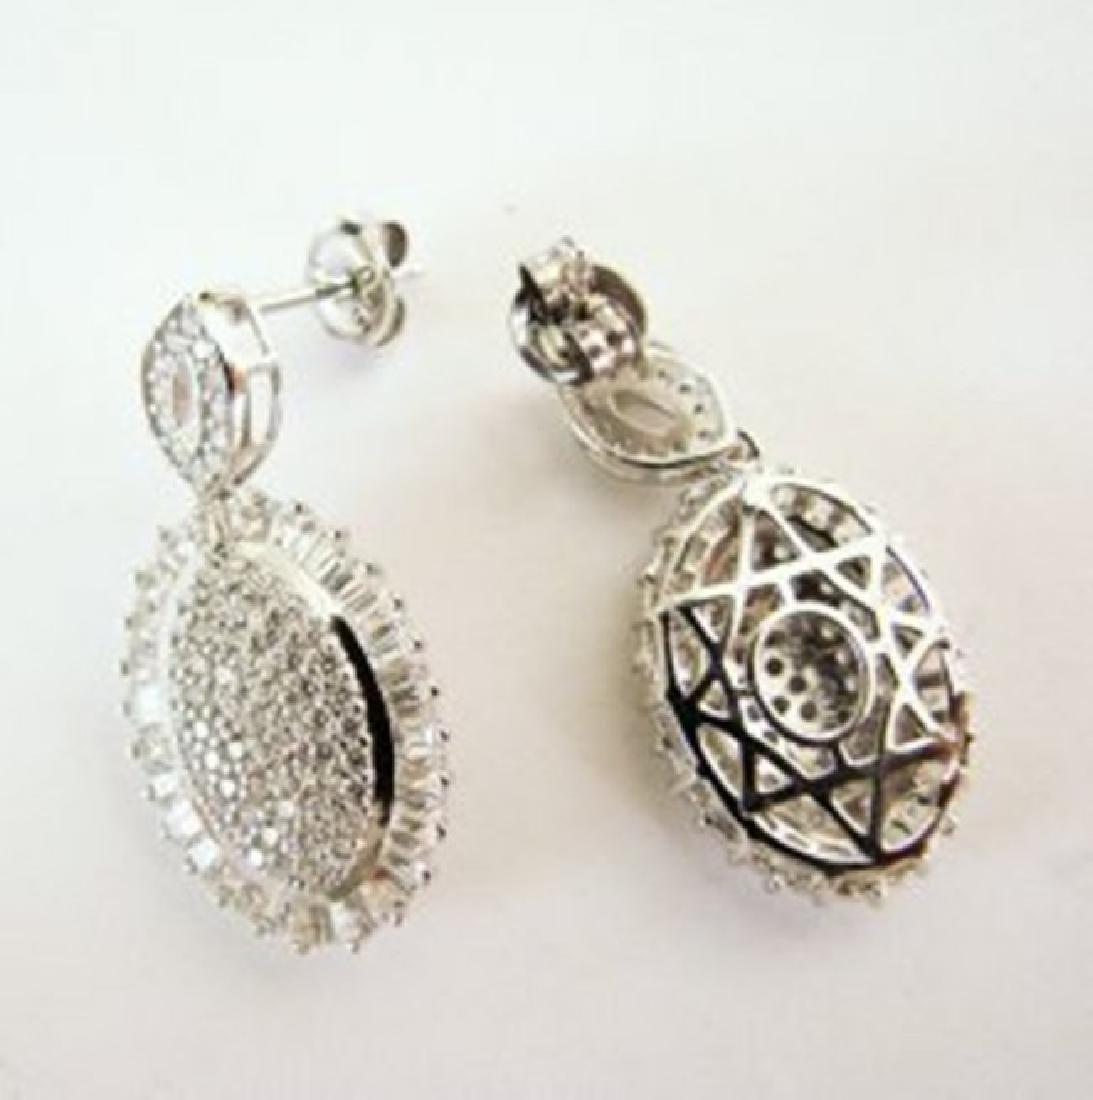 Creation Diamond Oval Earrings 4.28Ct 18k W/g Overlay - 4